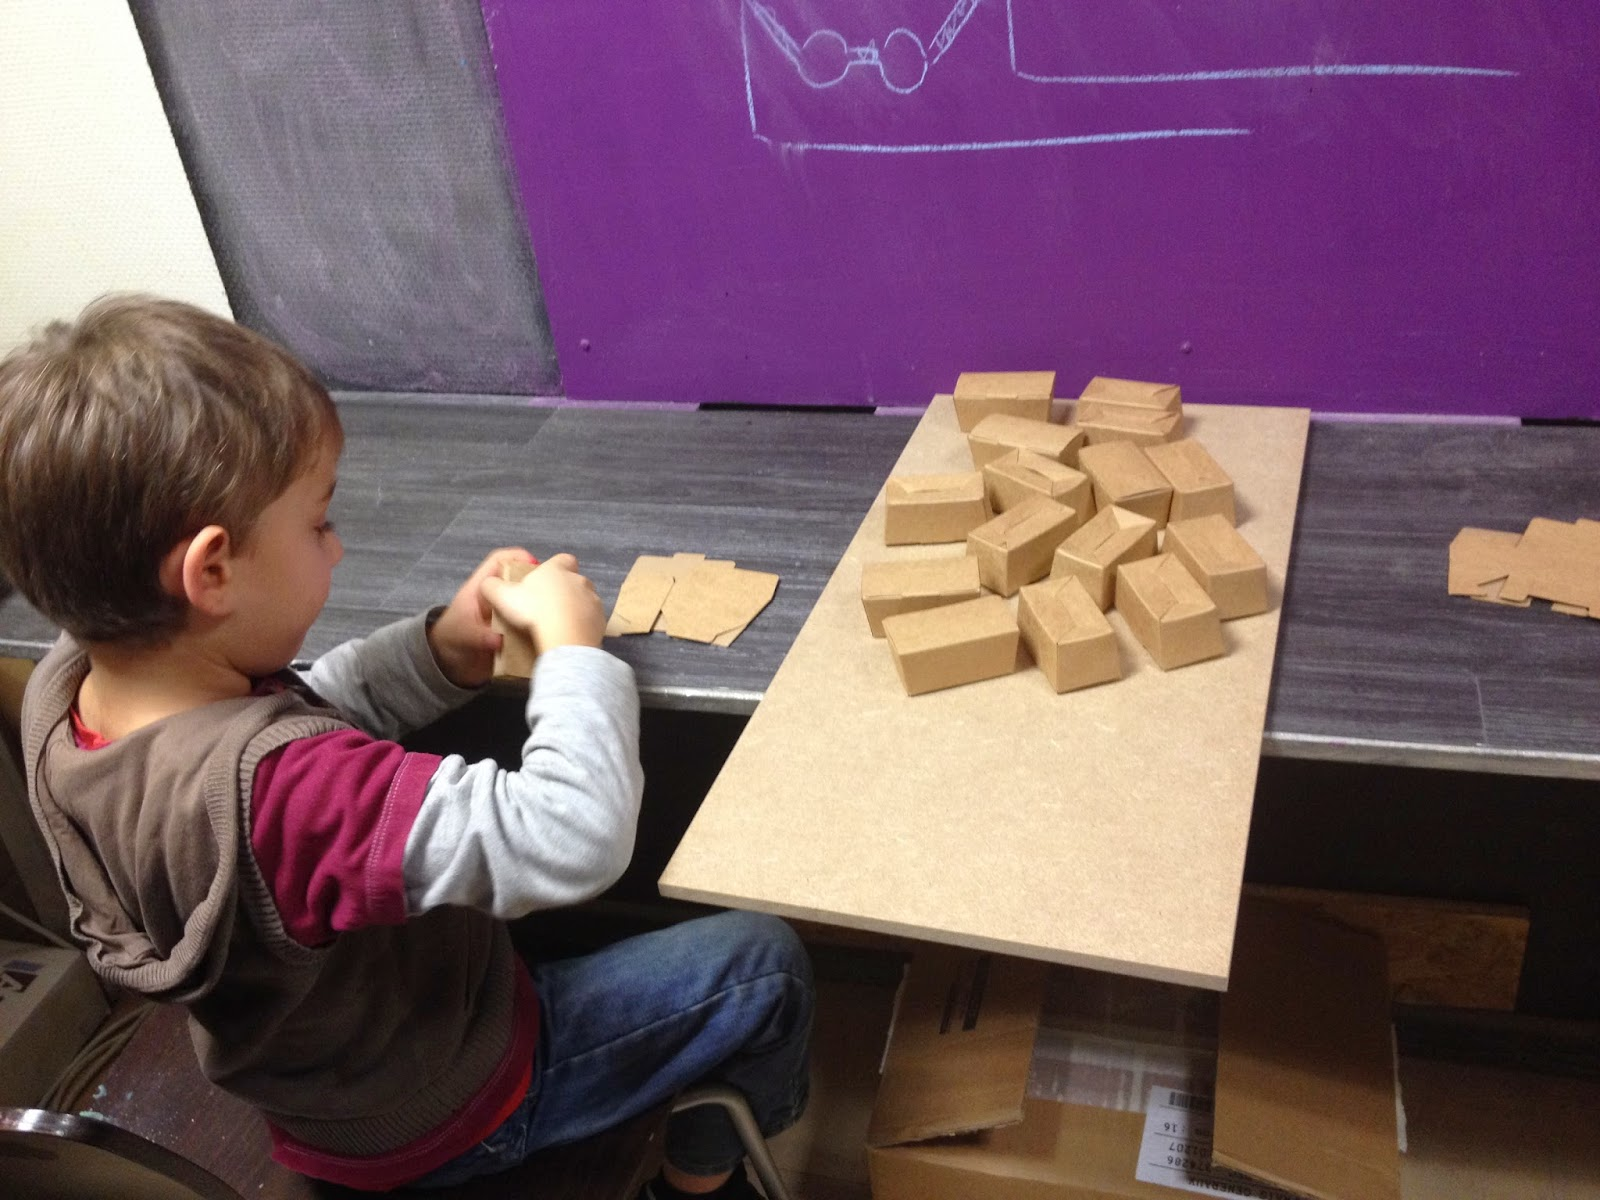 Calendrier de l 39 aven leroy merlin chartres bricolage enfants - Leroy merlin chartres ...